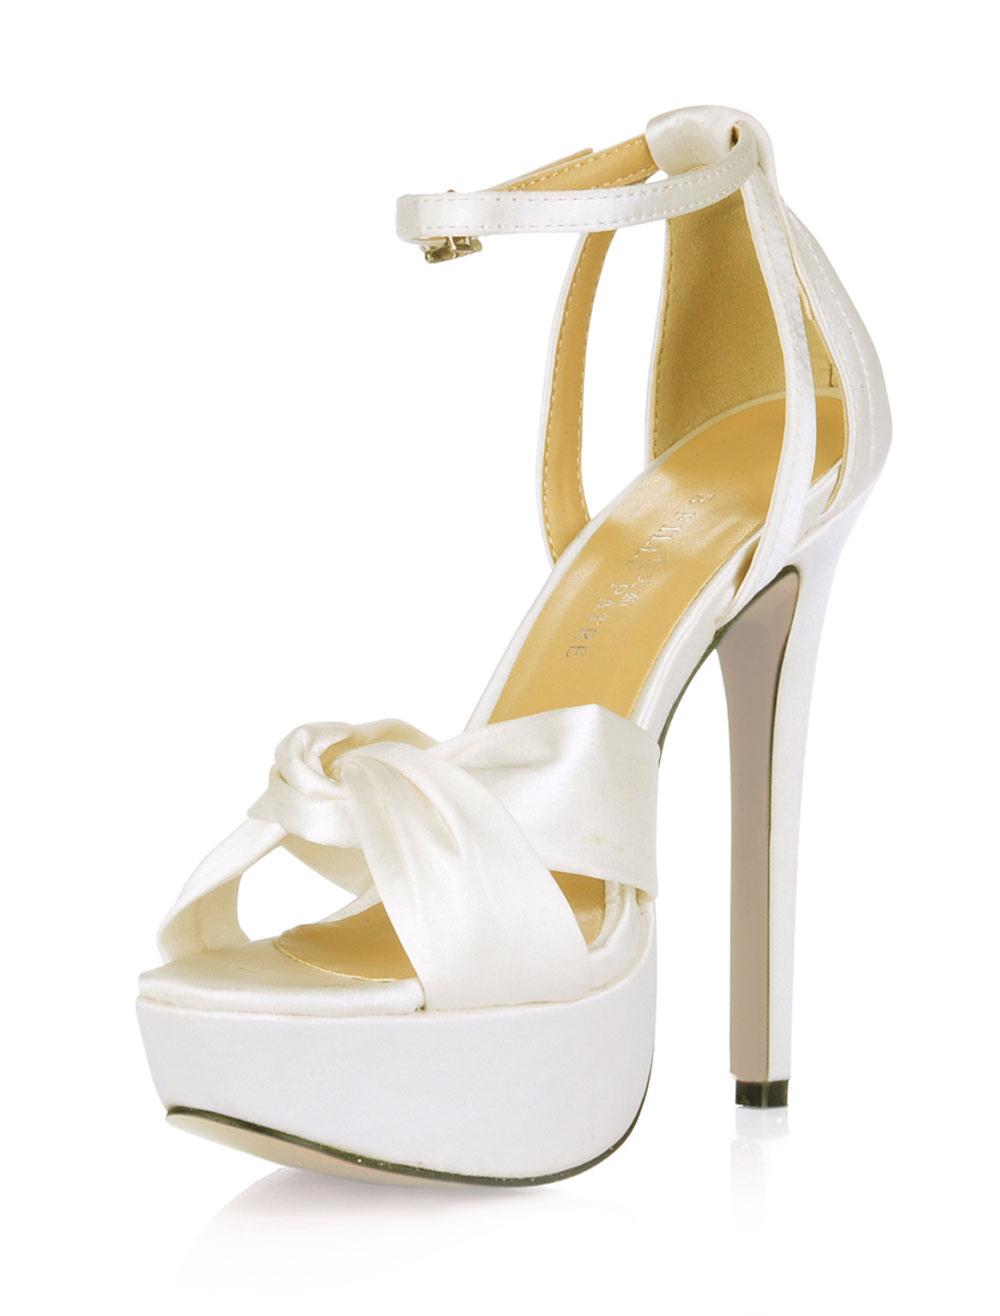 Zapatos de tacón de stiletto de puntera puntiaguada de satén elegantes para fiesta formal GO38z7